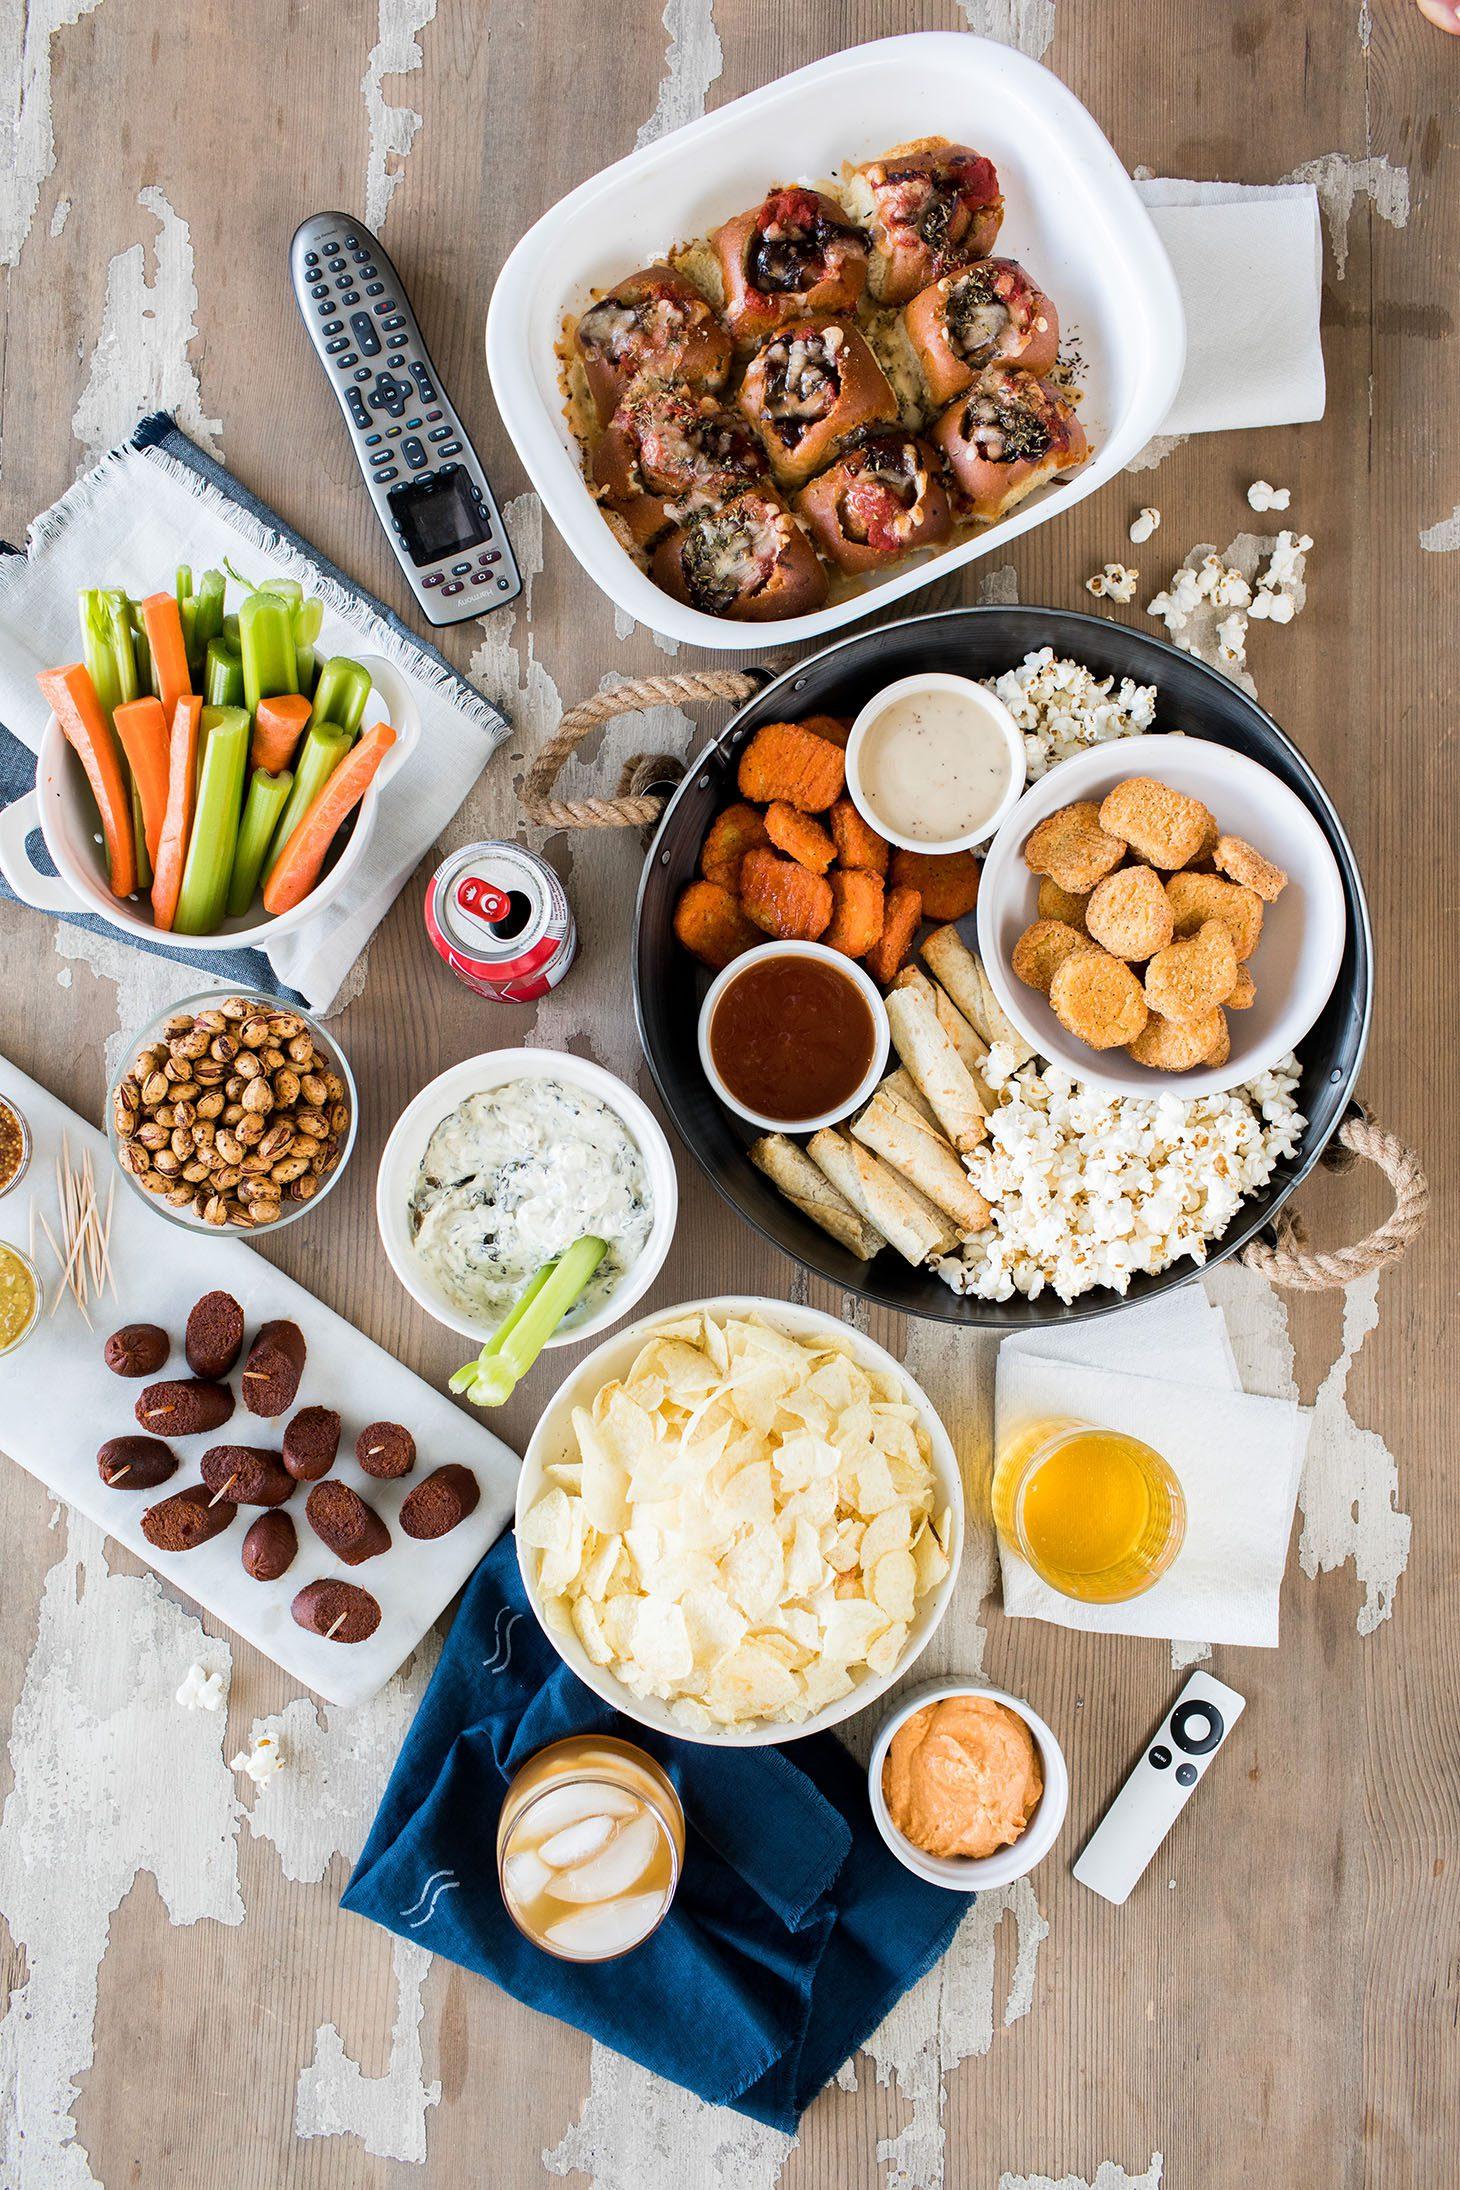 Jillian Harris Justins Take on Eating Plant-Based